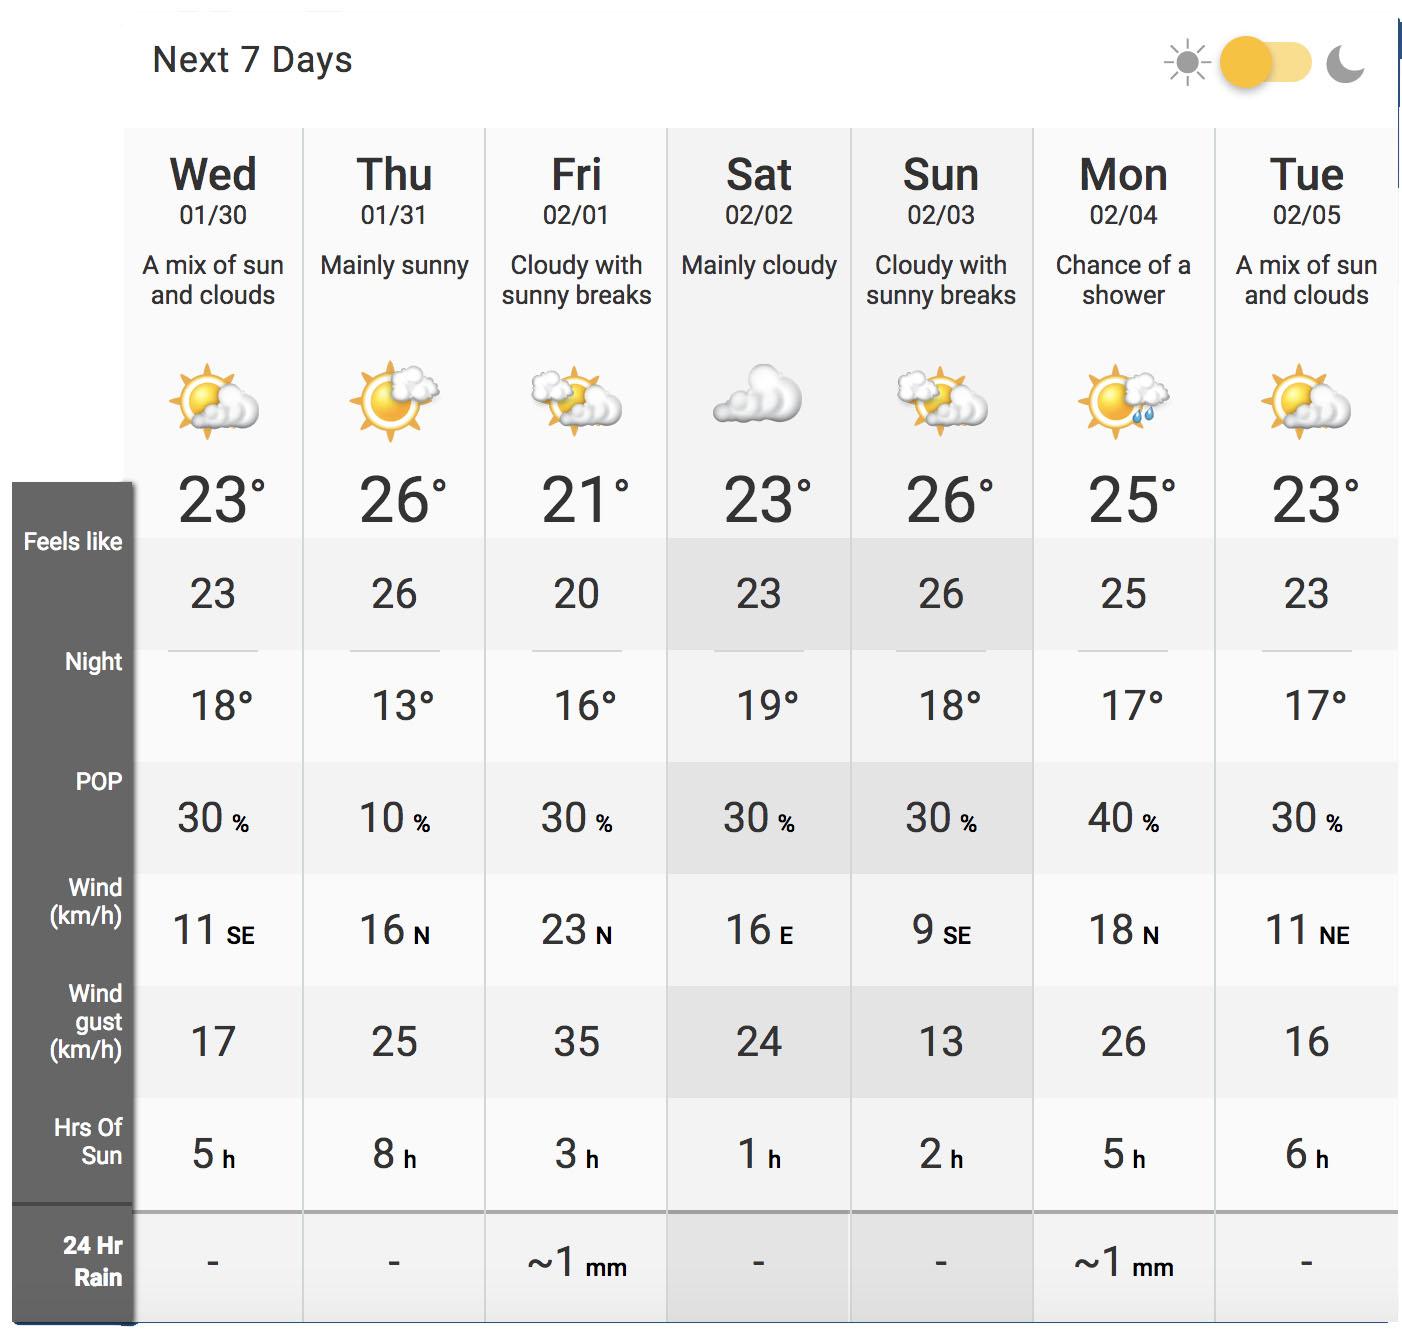 guangzhou_weather_forecast_1.30-2_.5_.jpg